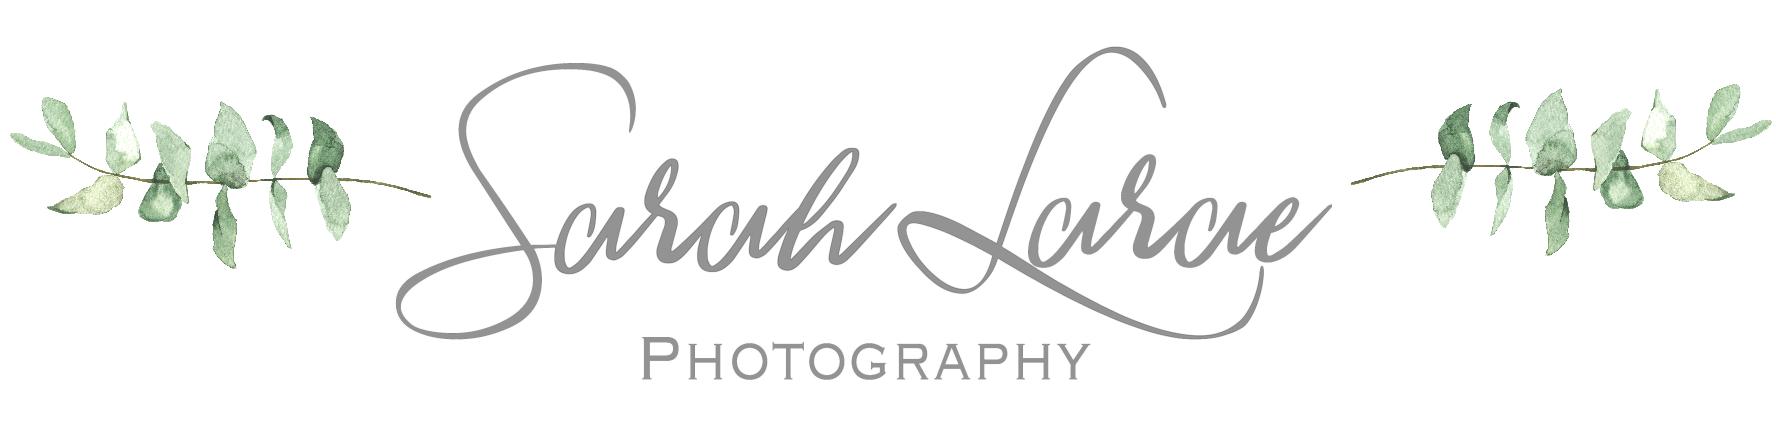 Chattanooga Wedding Photographer and Engagment Photography